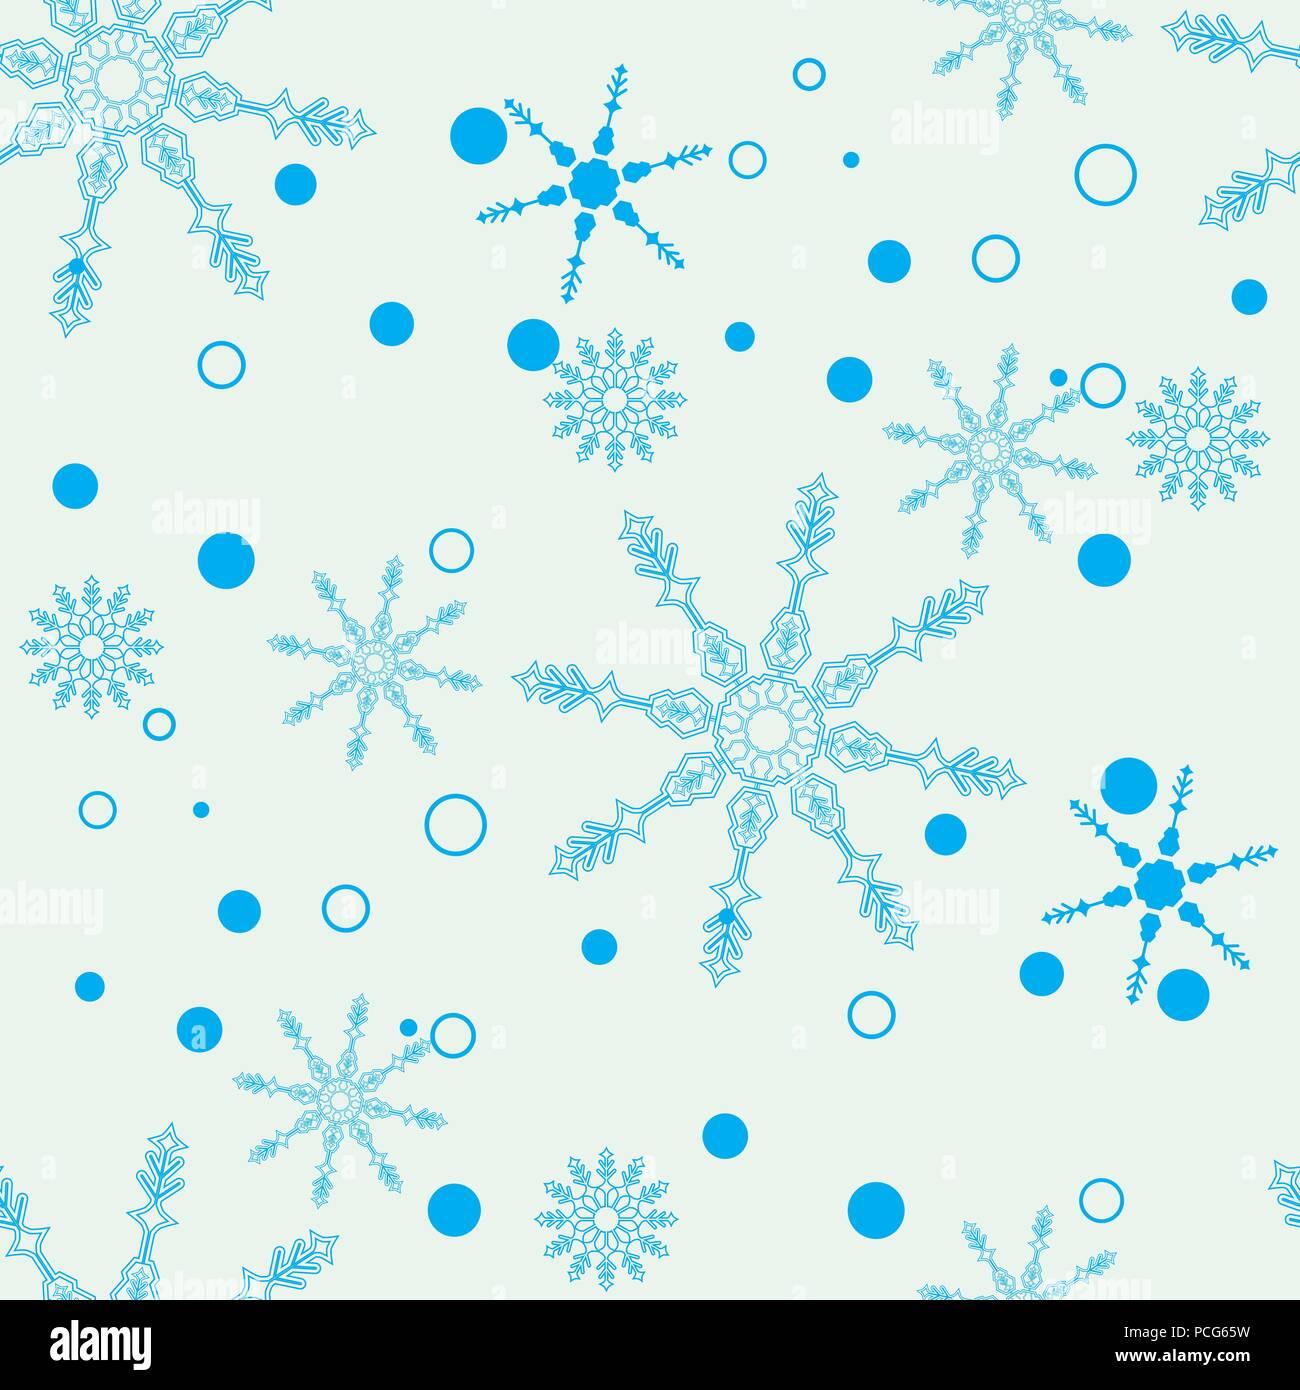 Christmas Wallpaper Snow Falling Snowflake Simple Seamless Pattern Blue Snow On White